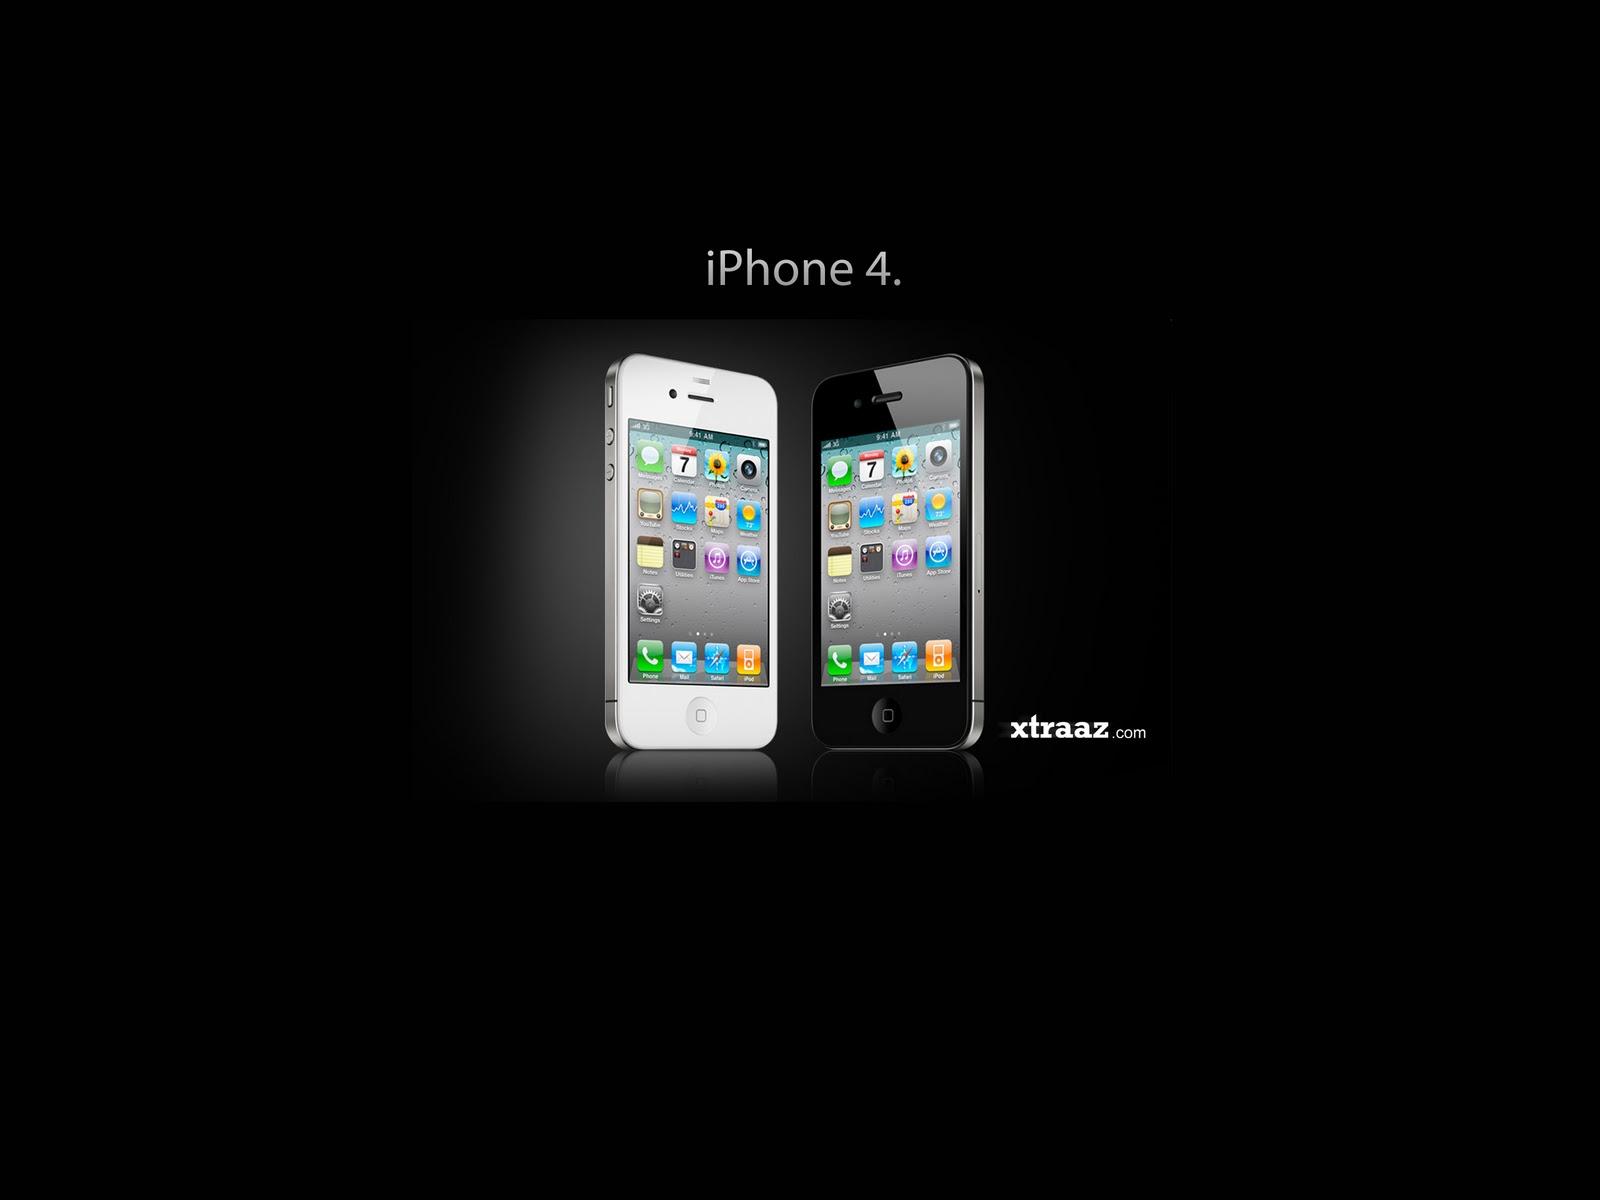 blogspotcom201208change iphone wallpaperhtml 1600x1200